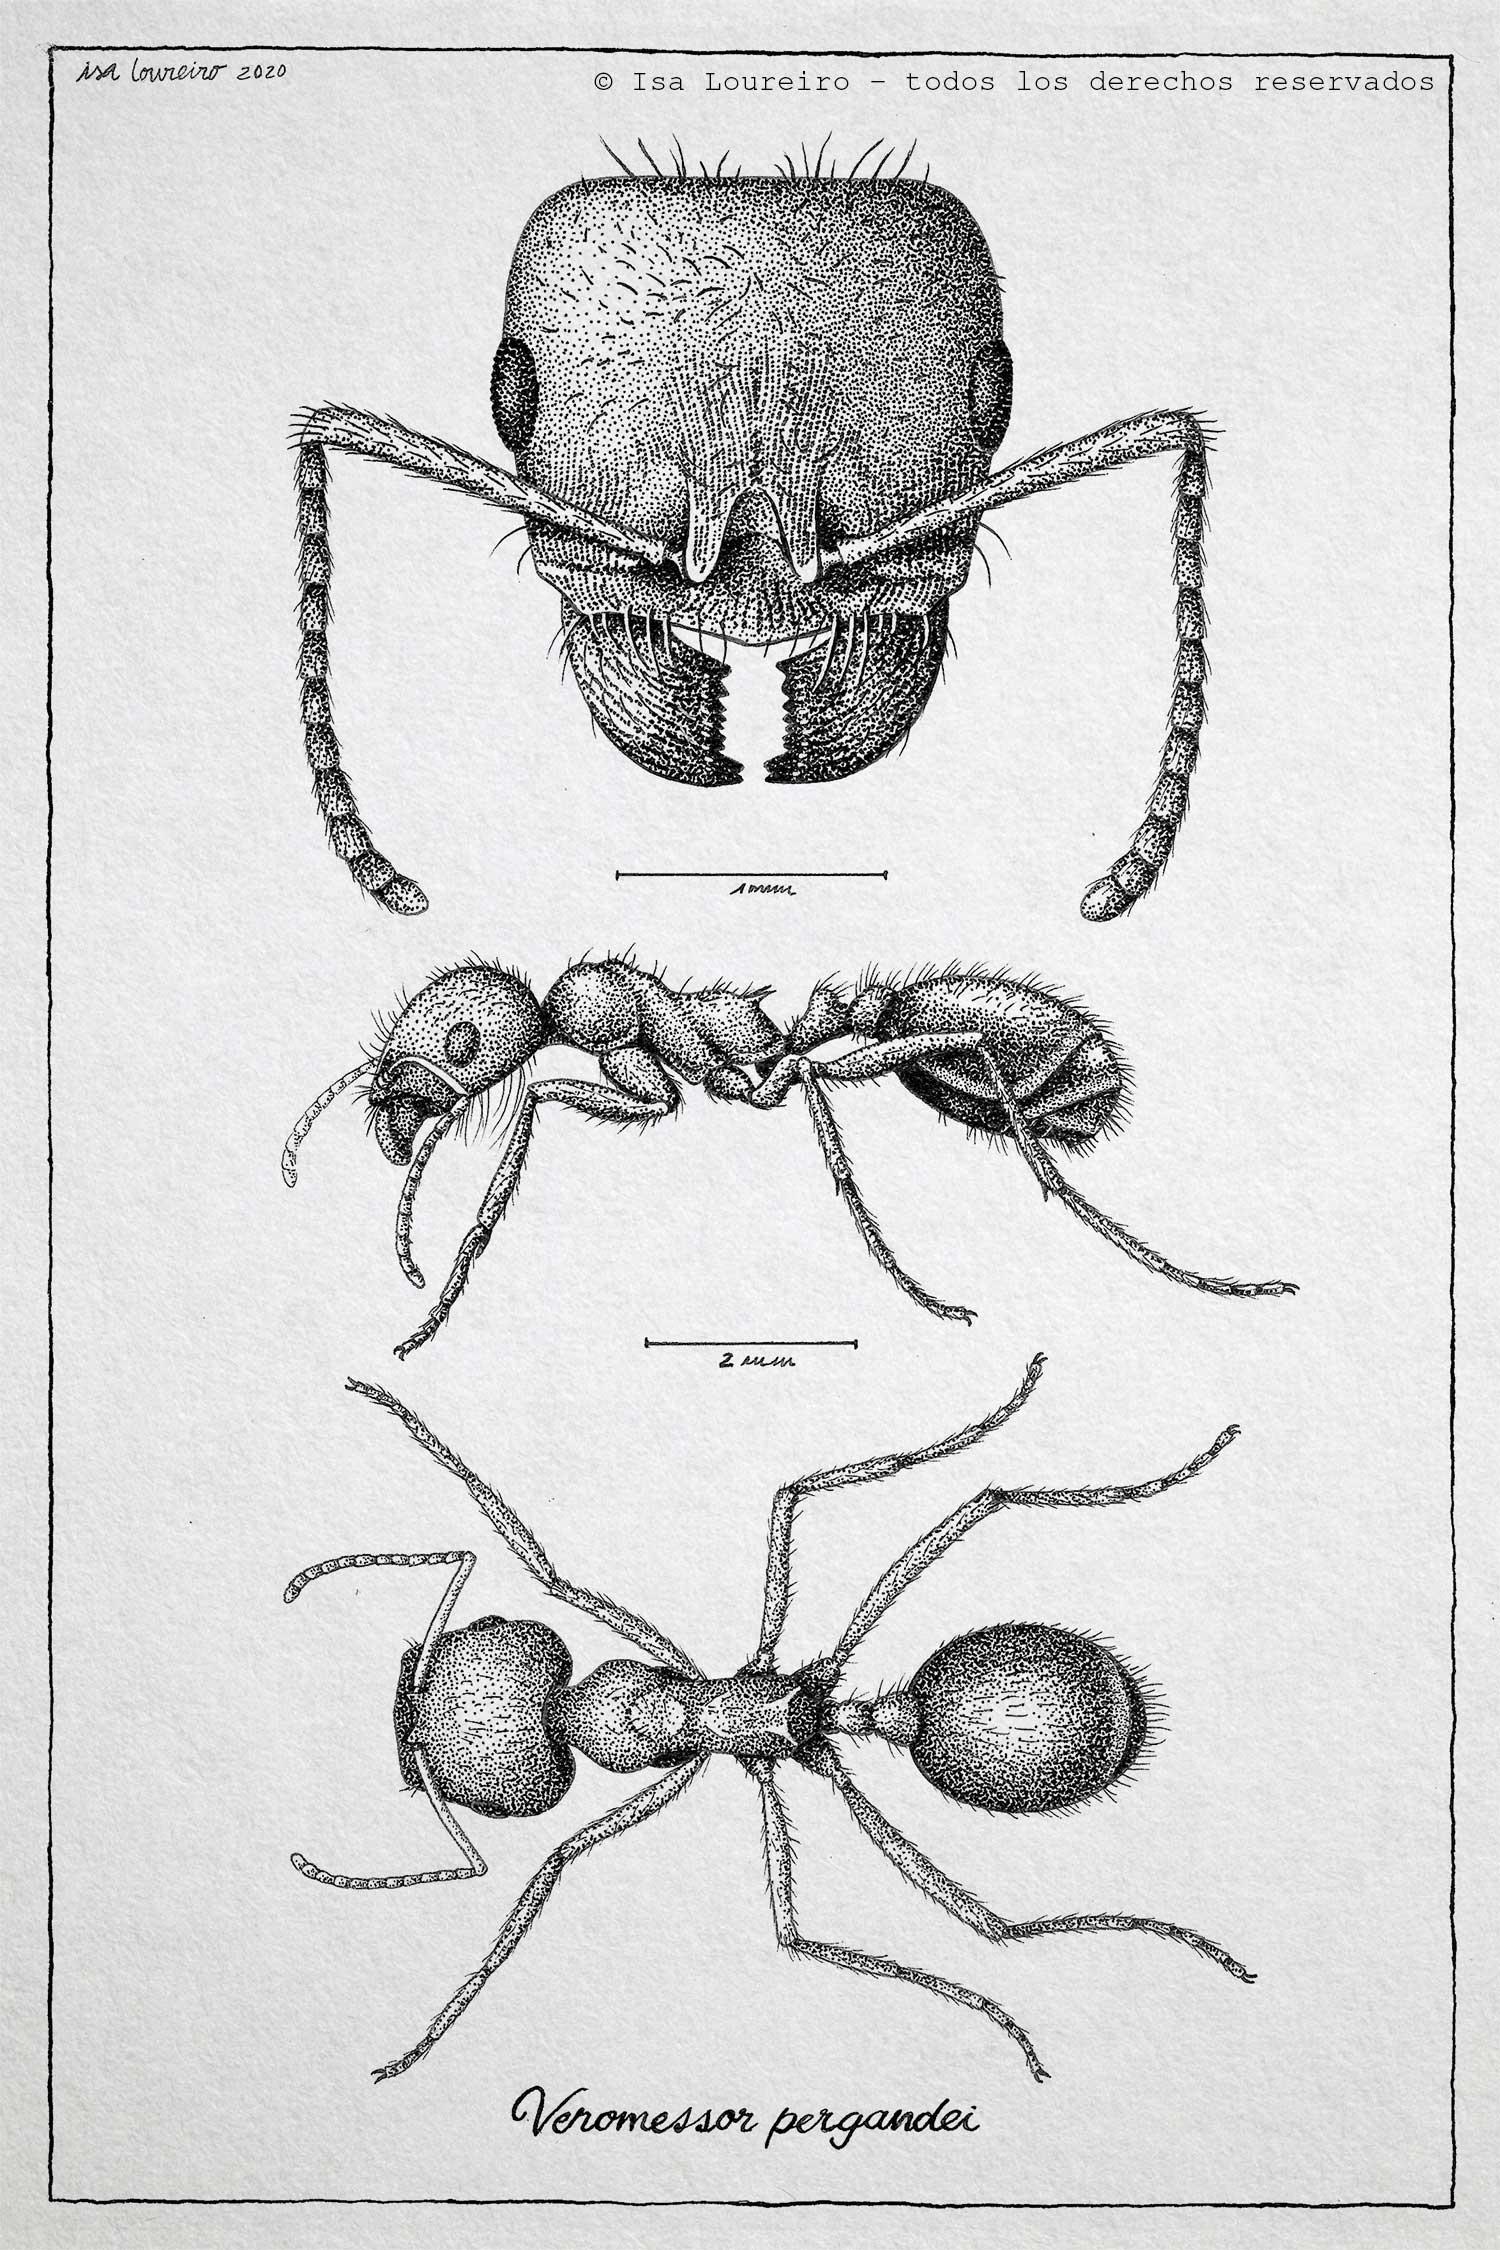 Hormiga Veromessor pergandei